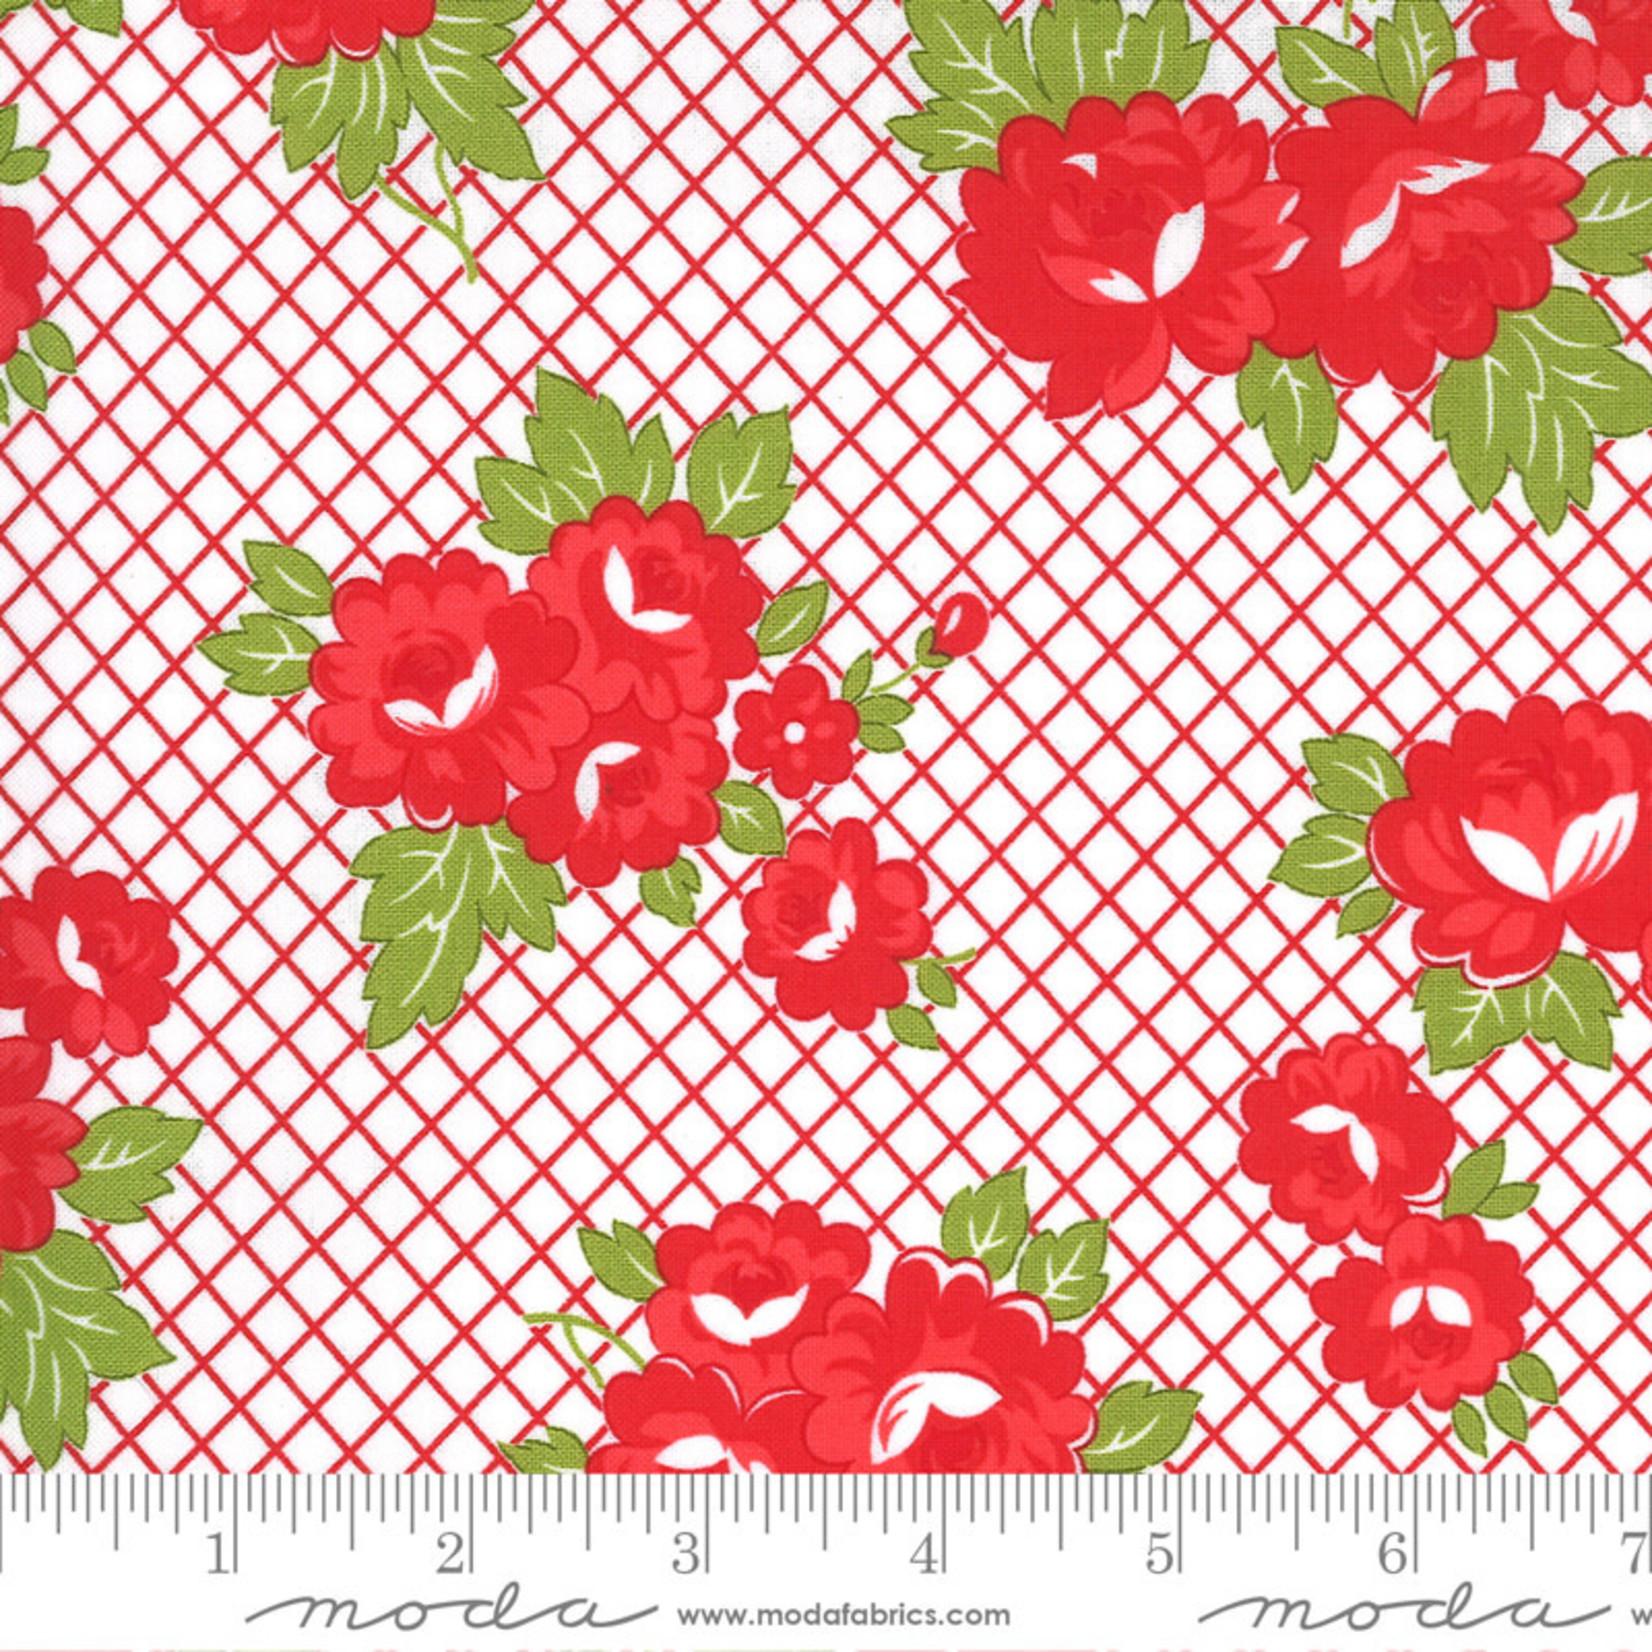 Bonnie & Camille Sunday Stroll, Garden, Red 55221 12 $0.20 per cm or $20/m